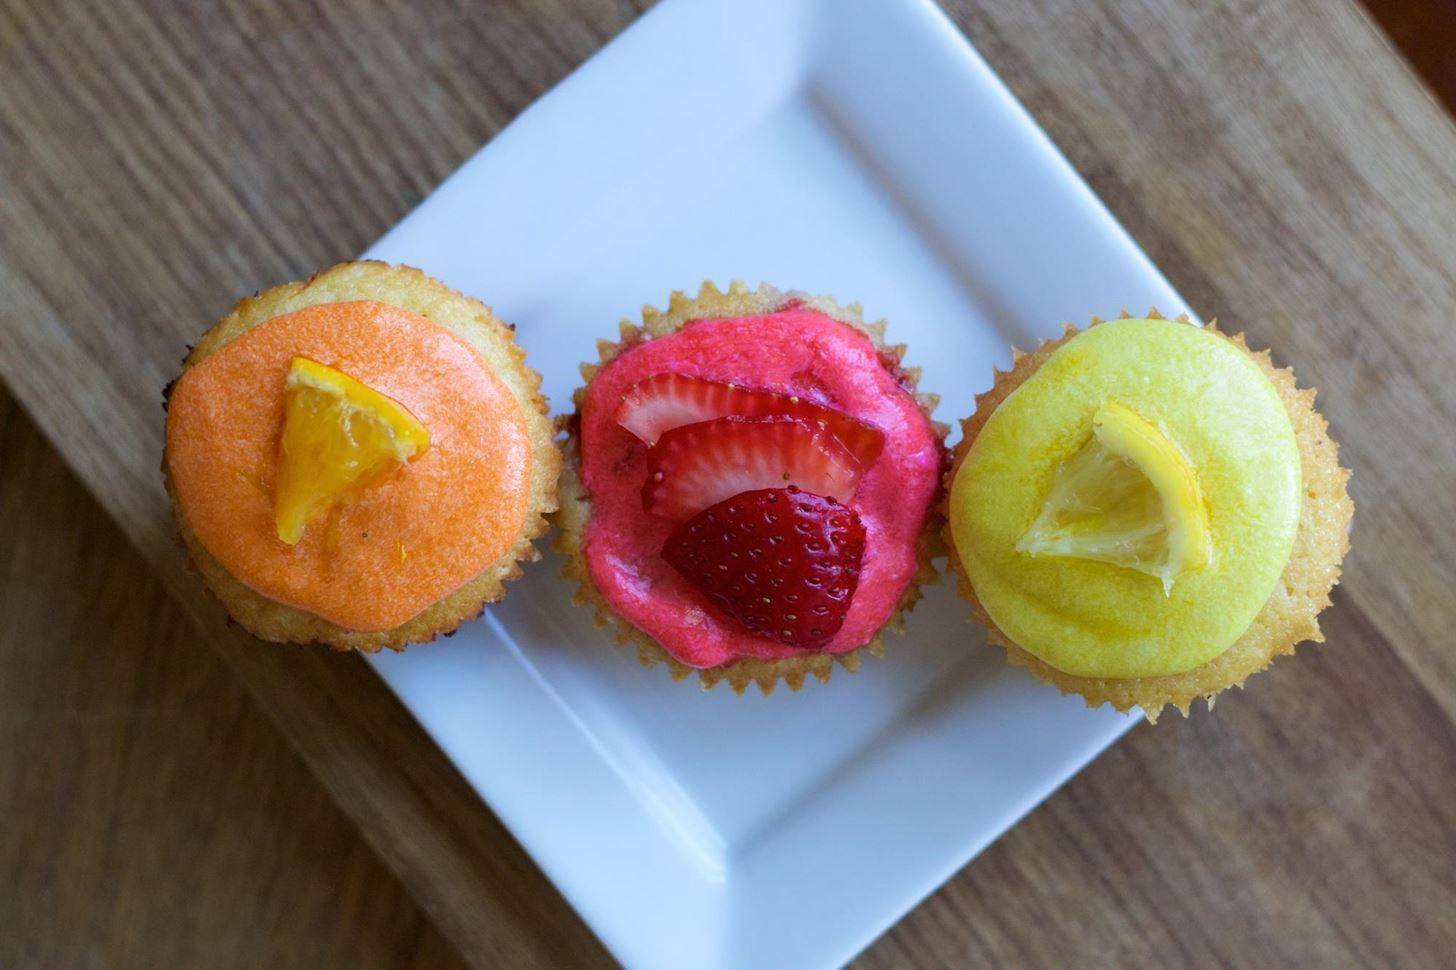 One Versatile Cupcake Recipe... Three Fruity Variations